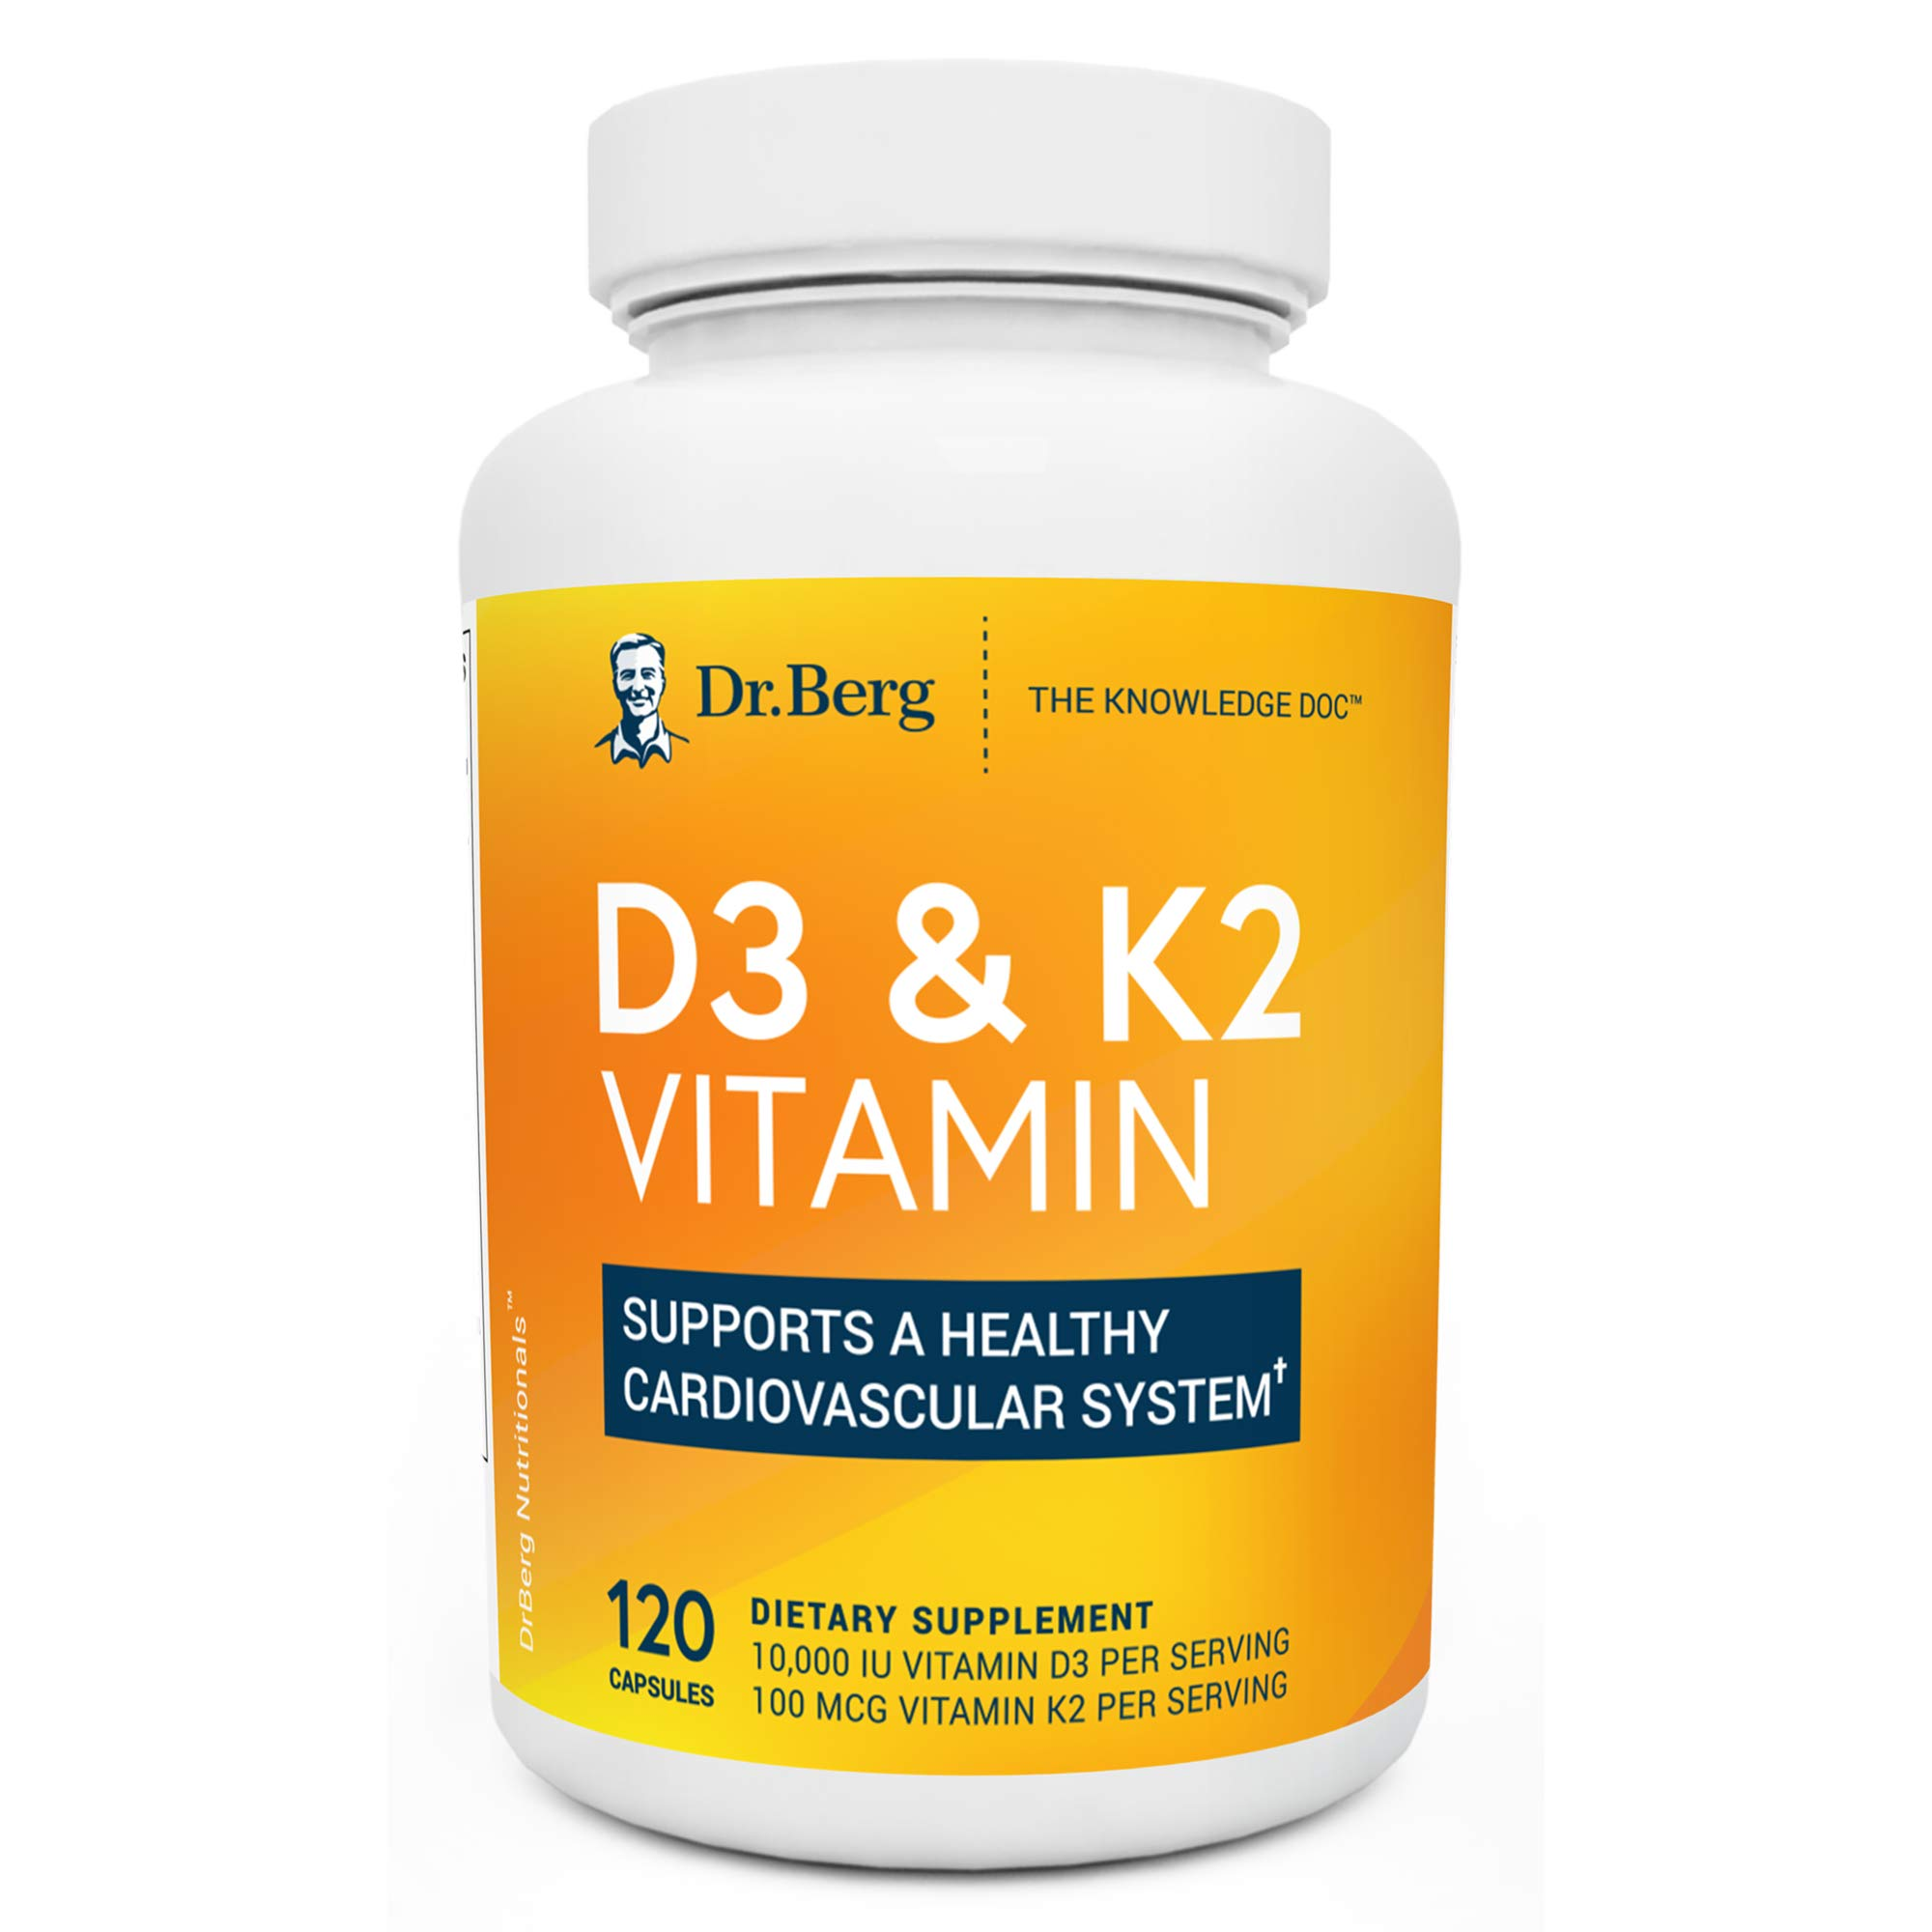 Dr. Berg's D3 & K2 Vitamin - D3K2 Supplement w/ Purified Bile Salts - Support Healthy Heart, Bone & Joint - 10,000 IU of Vitamin D3 & 100 mcg of Vitamin K2 MK7 - 120 Capsules